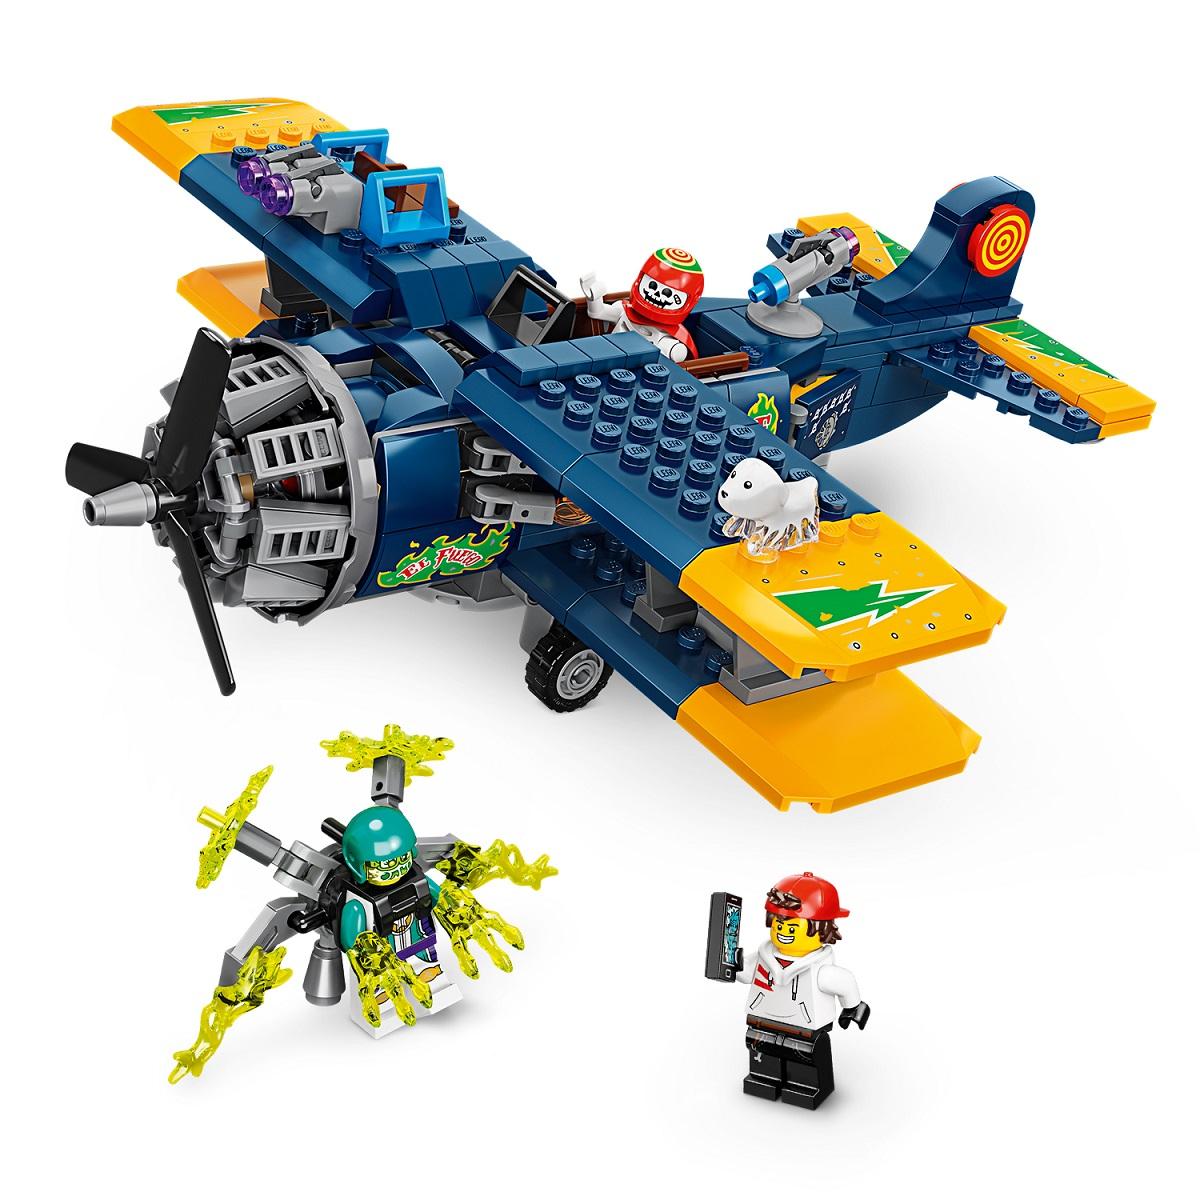 LEGO® Hidden Side™ 70429 El Fuegos Stunt-Flugzeug Minifigs